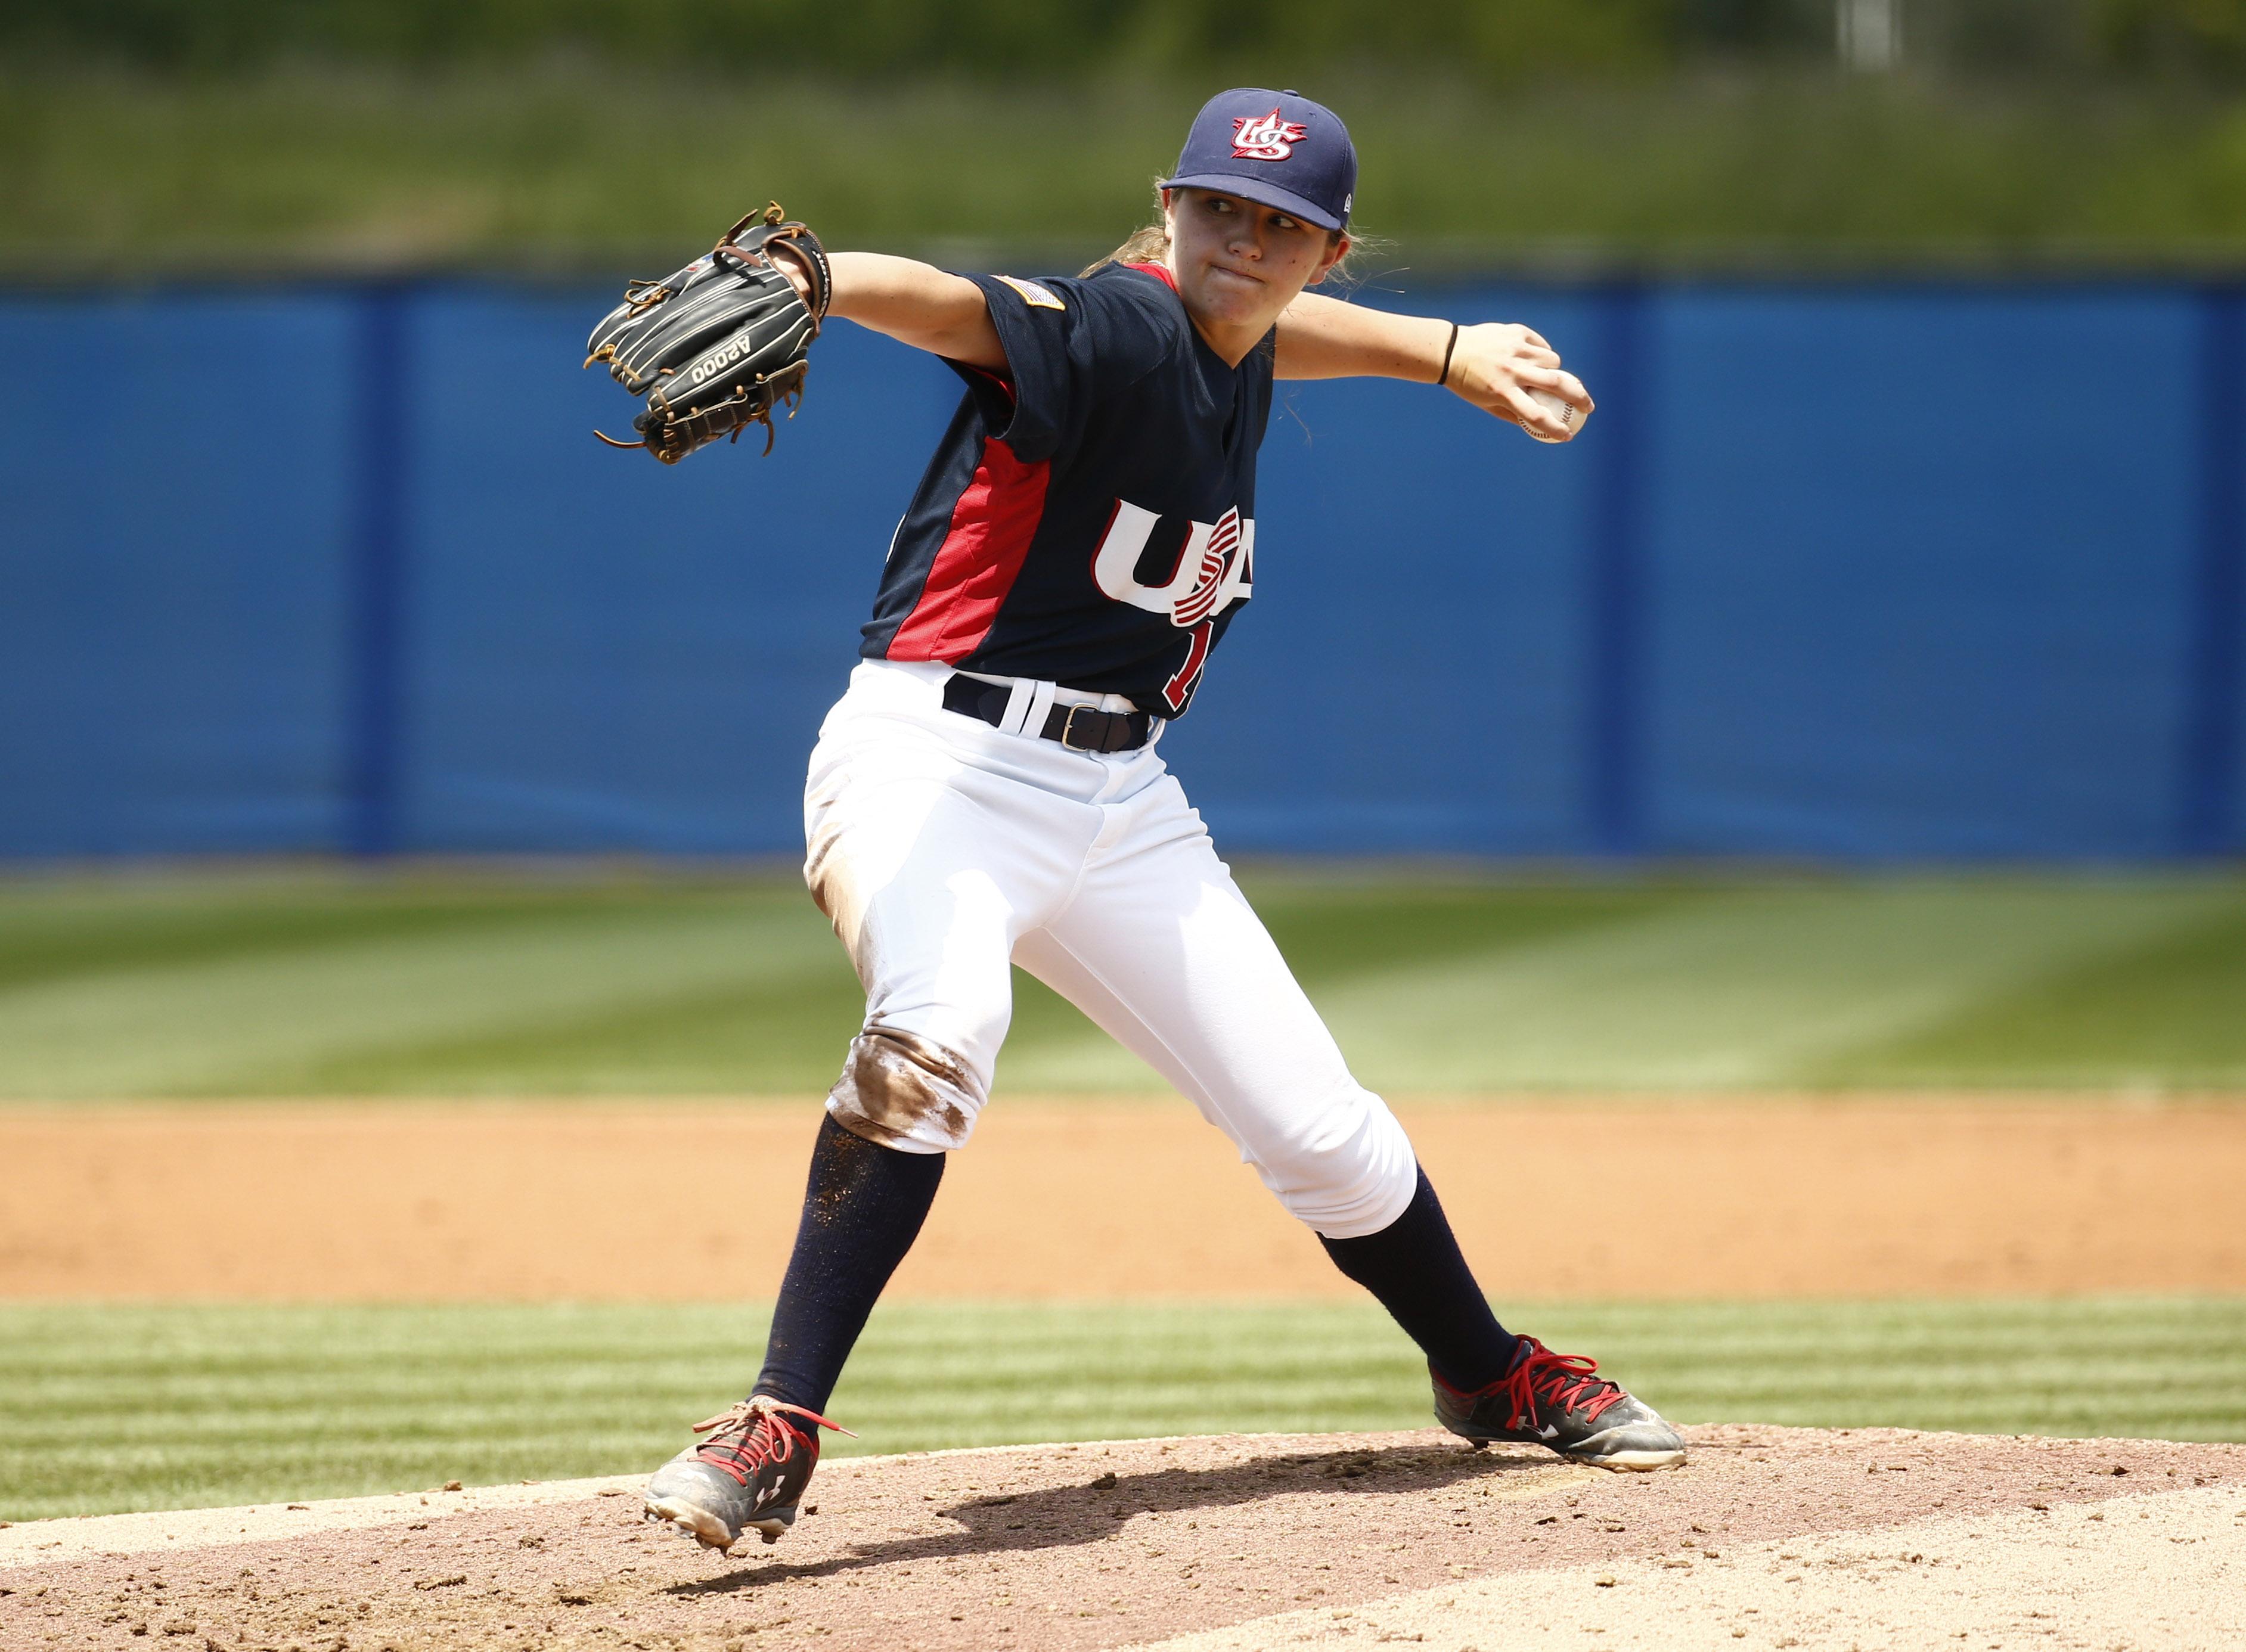 8719430-pan-am-games-womens-baseball-canada-vs-united-states